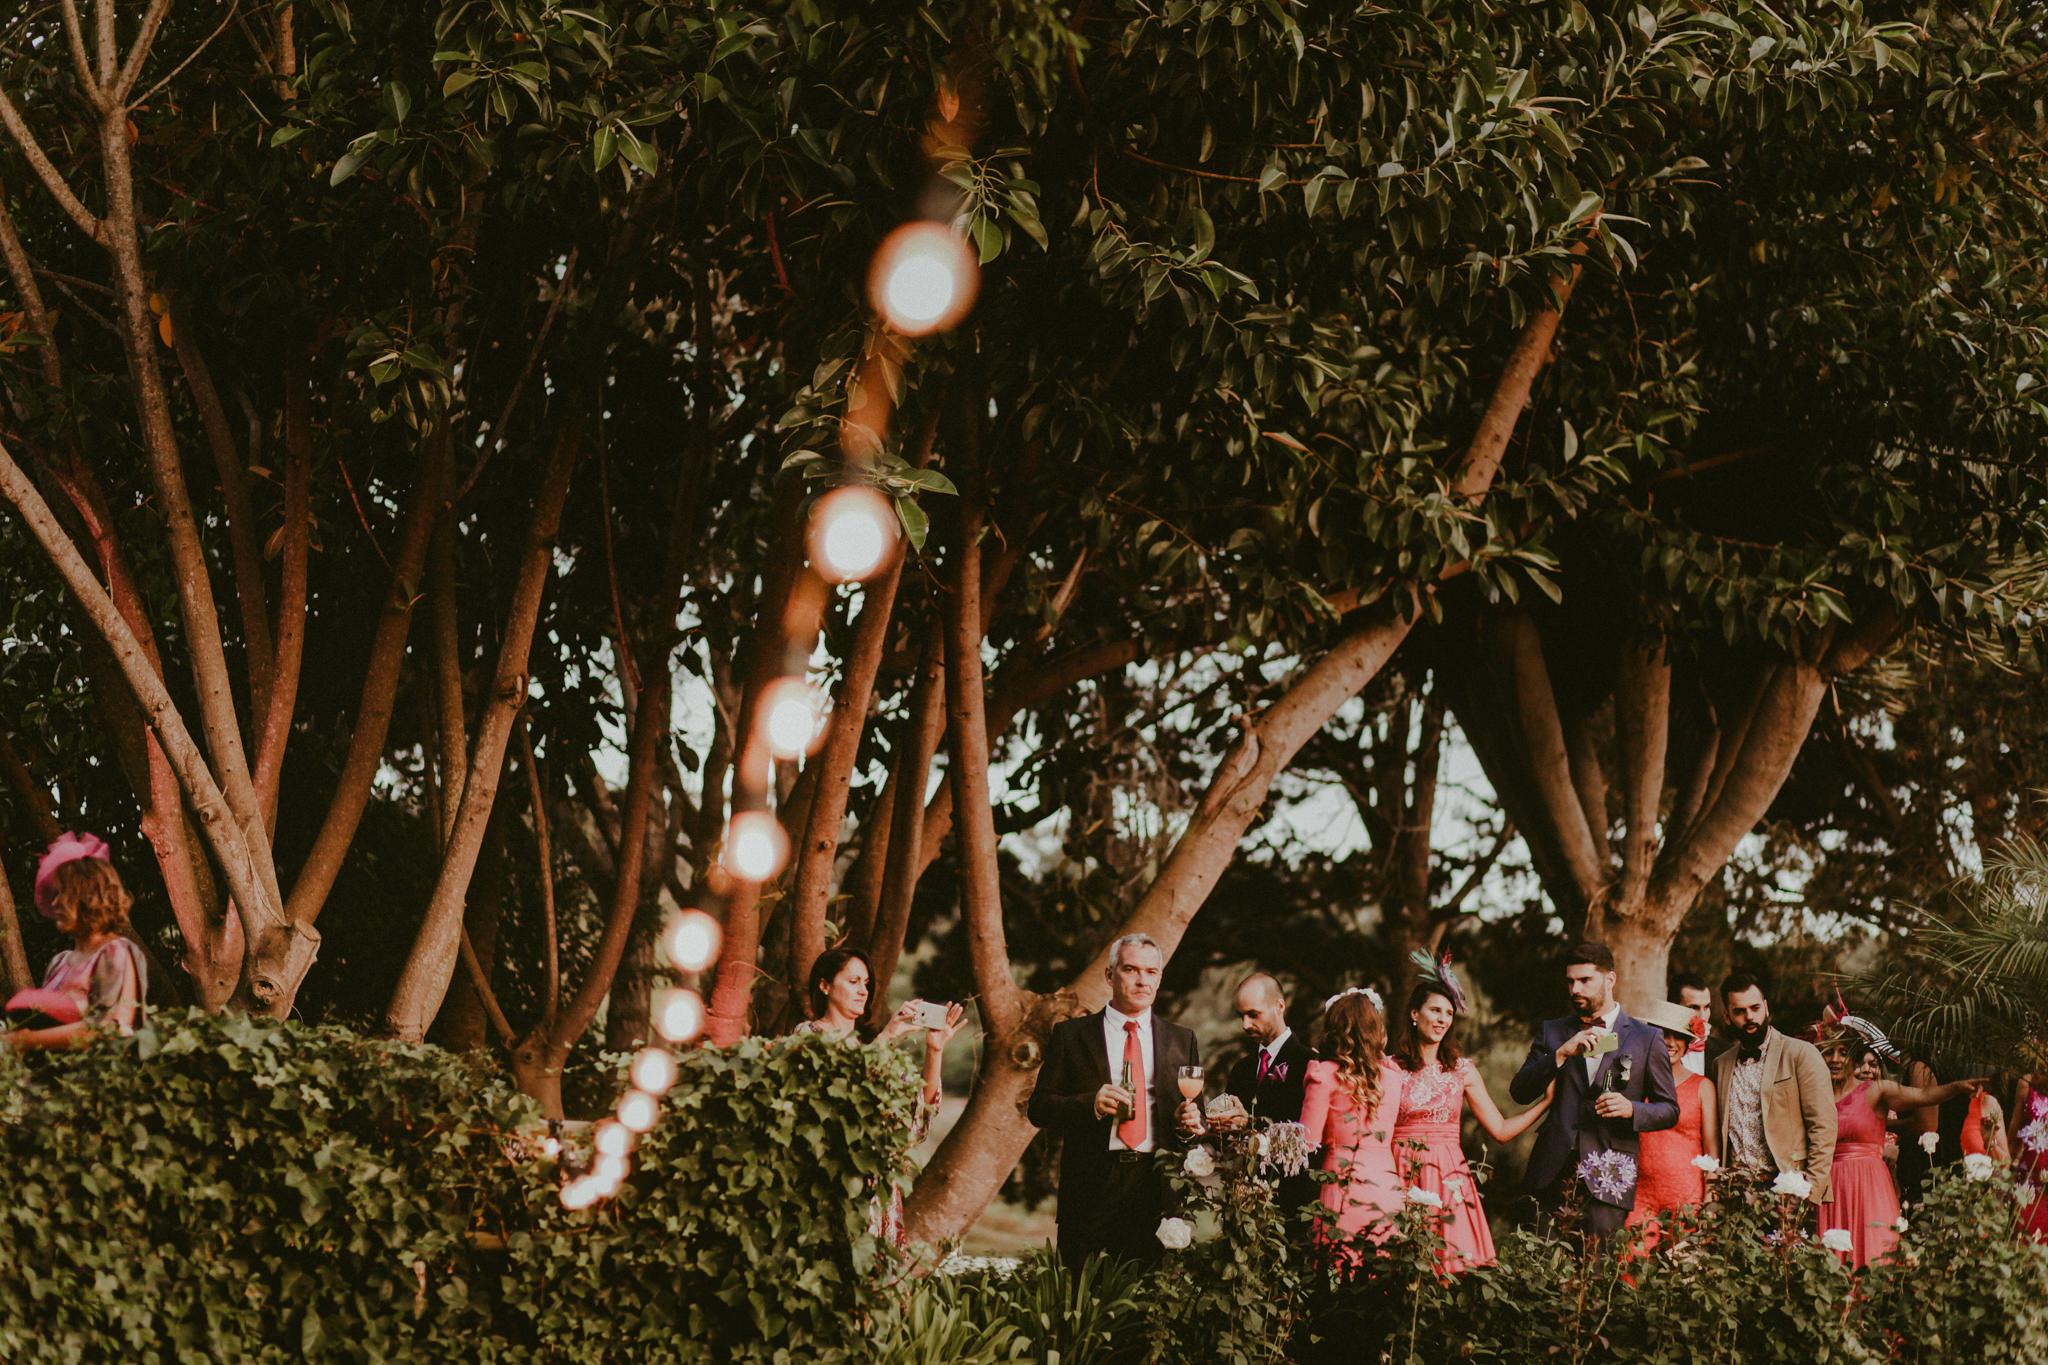 boda-diferente-fotografo-boda-laspalmas-grancanaria-71